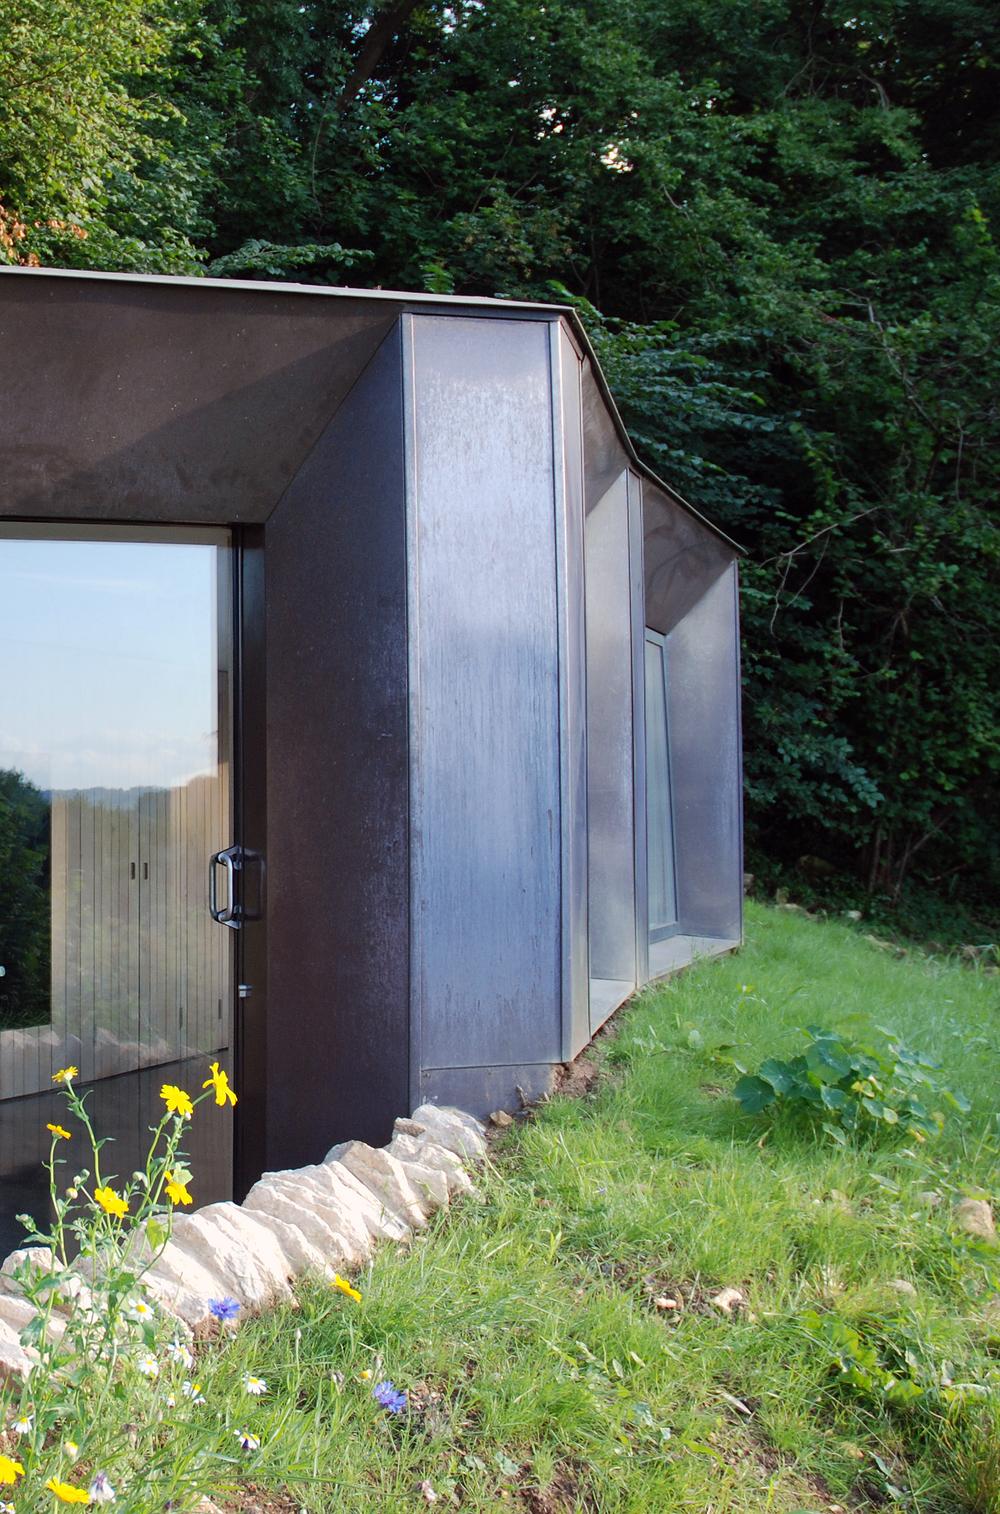 Myrtle cottage garden studio riba national award 2015 for Small backyard studio